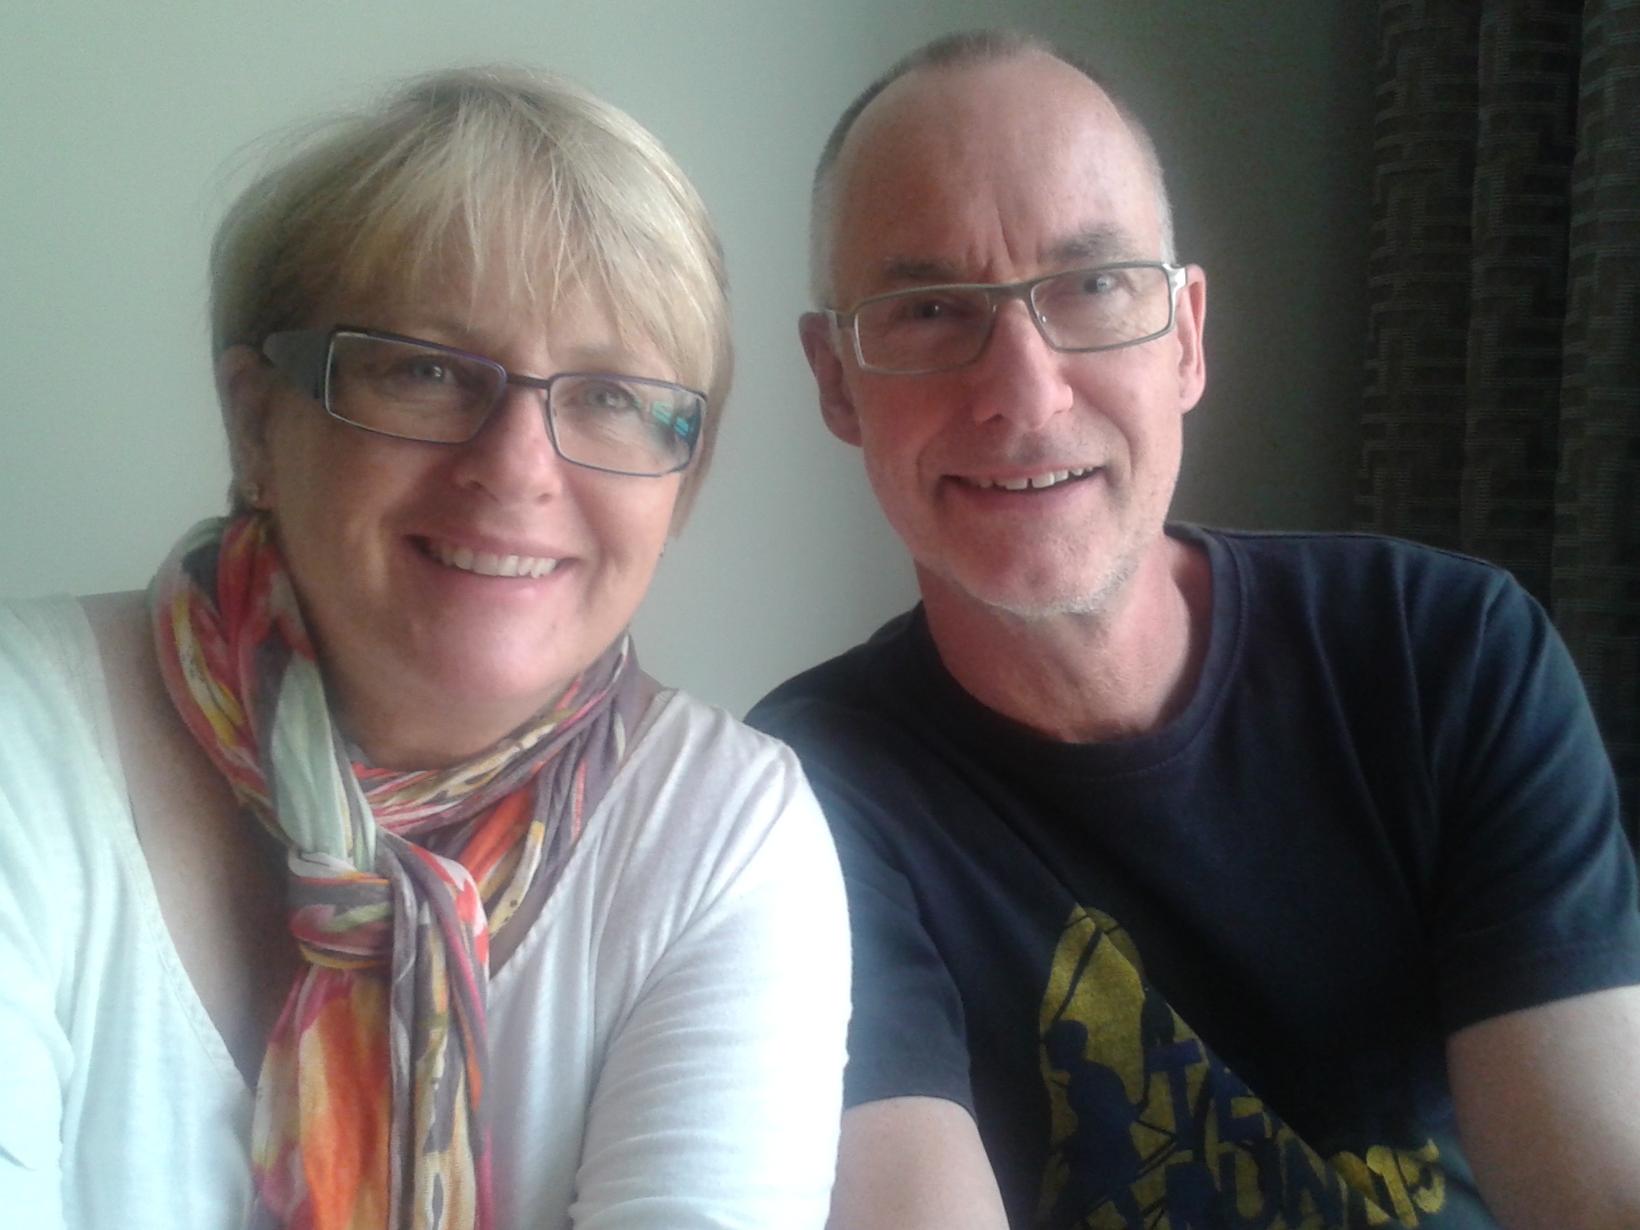 Theresa & Jon from New Glasgow, Nova Scotia, Canada